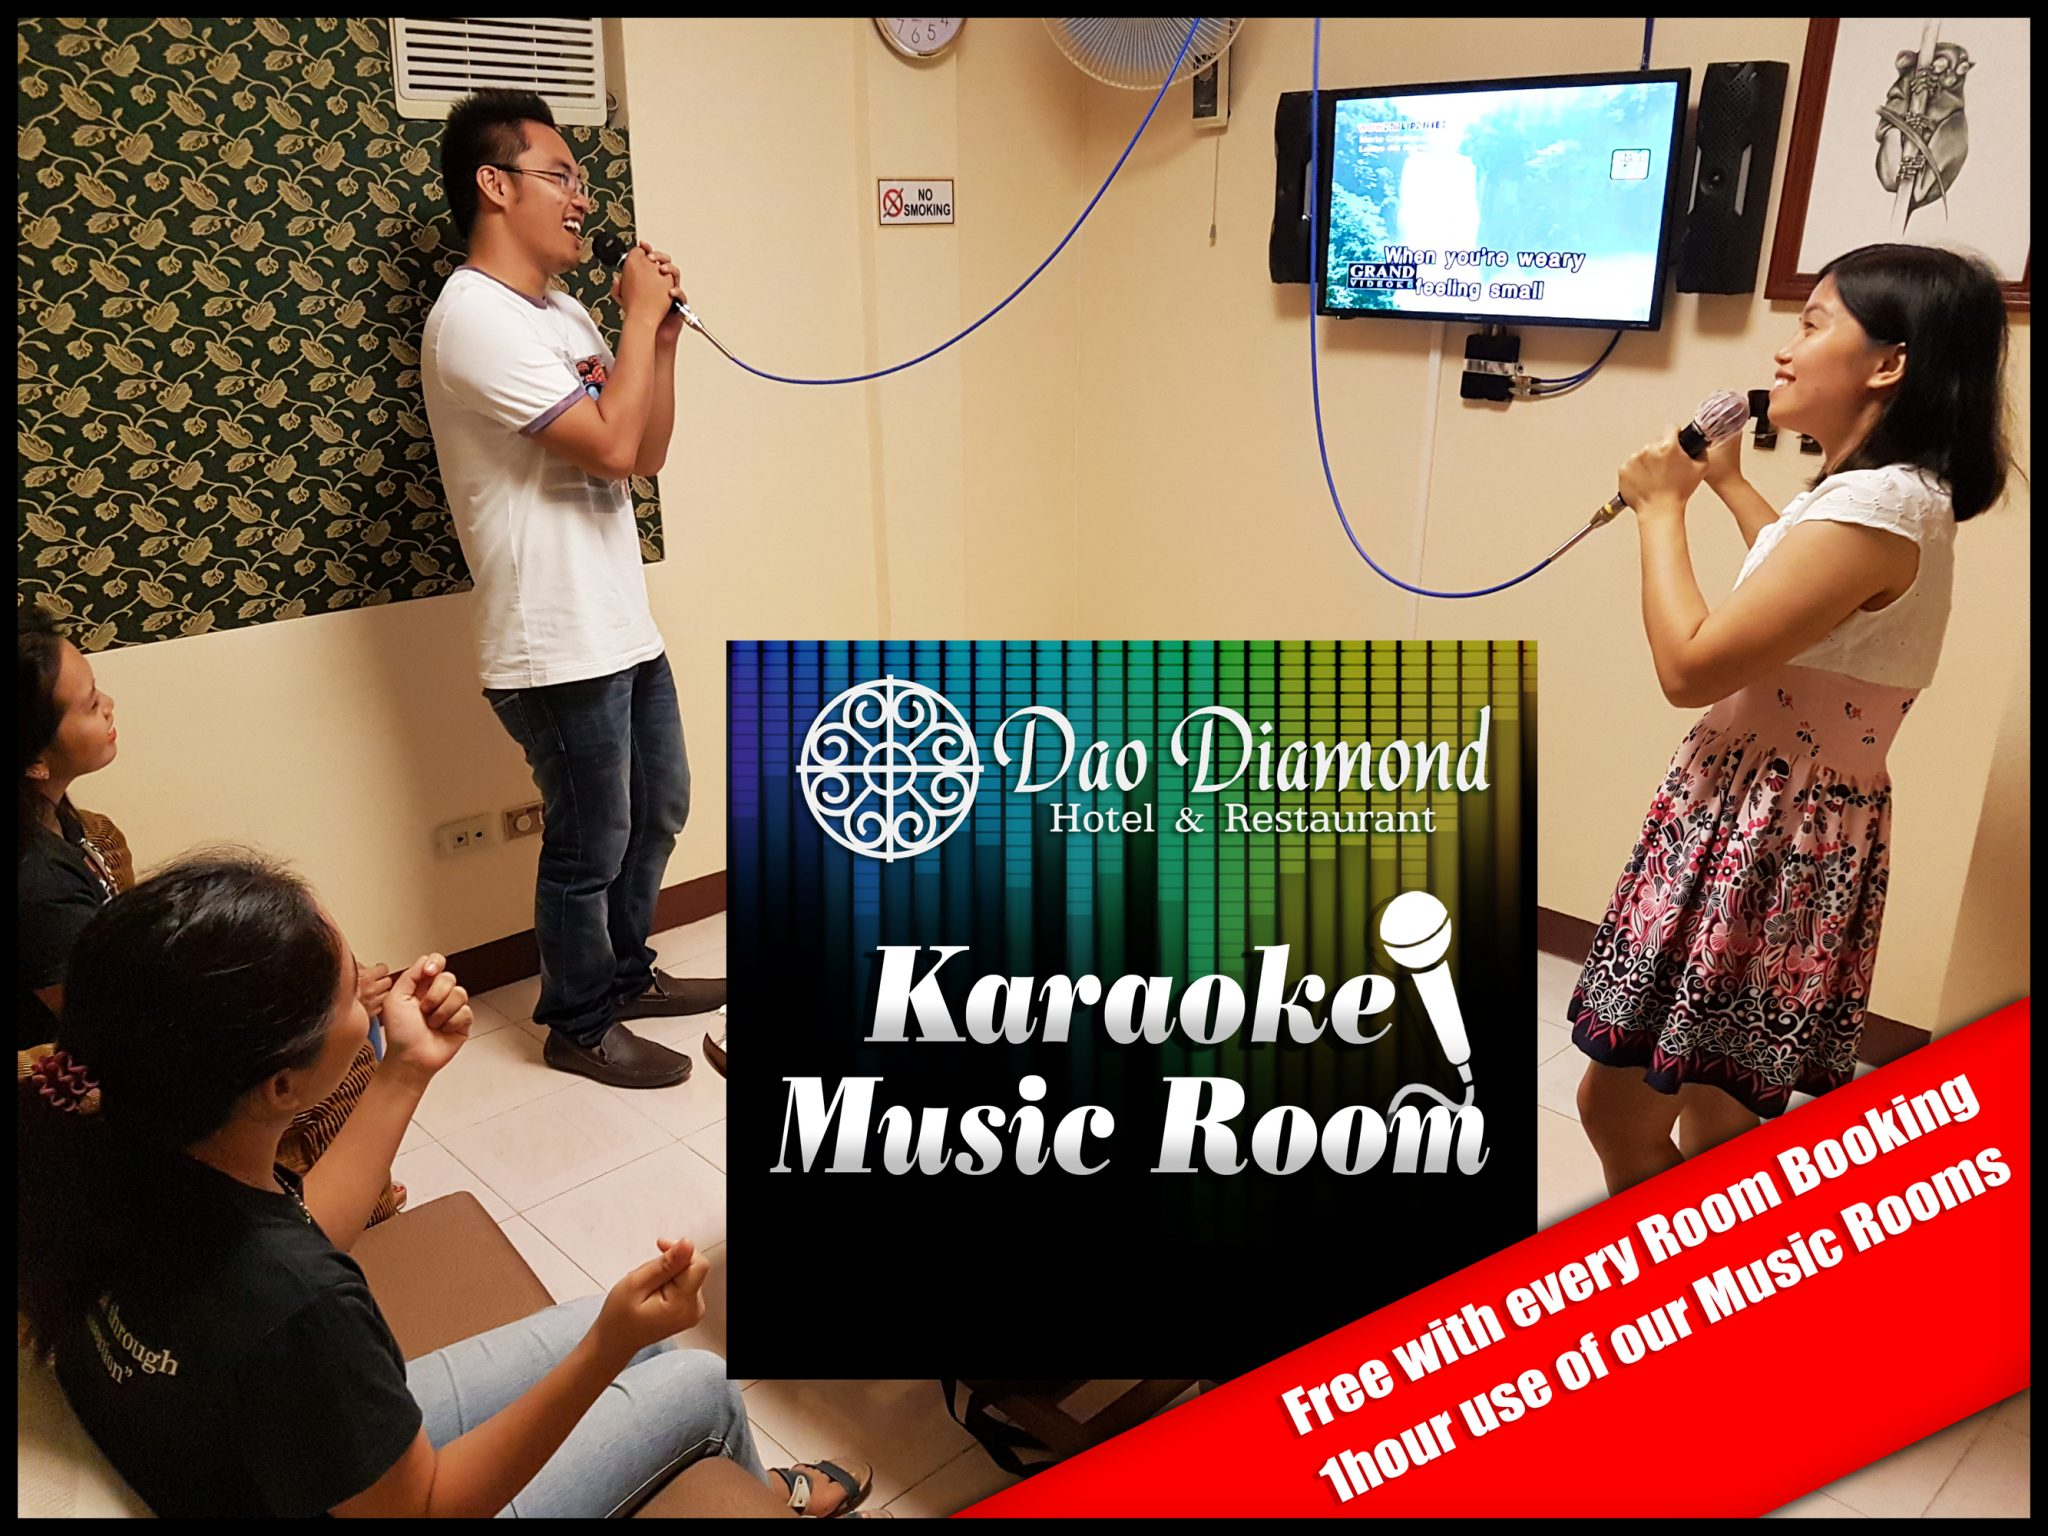 dao diamond karaoke